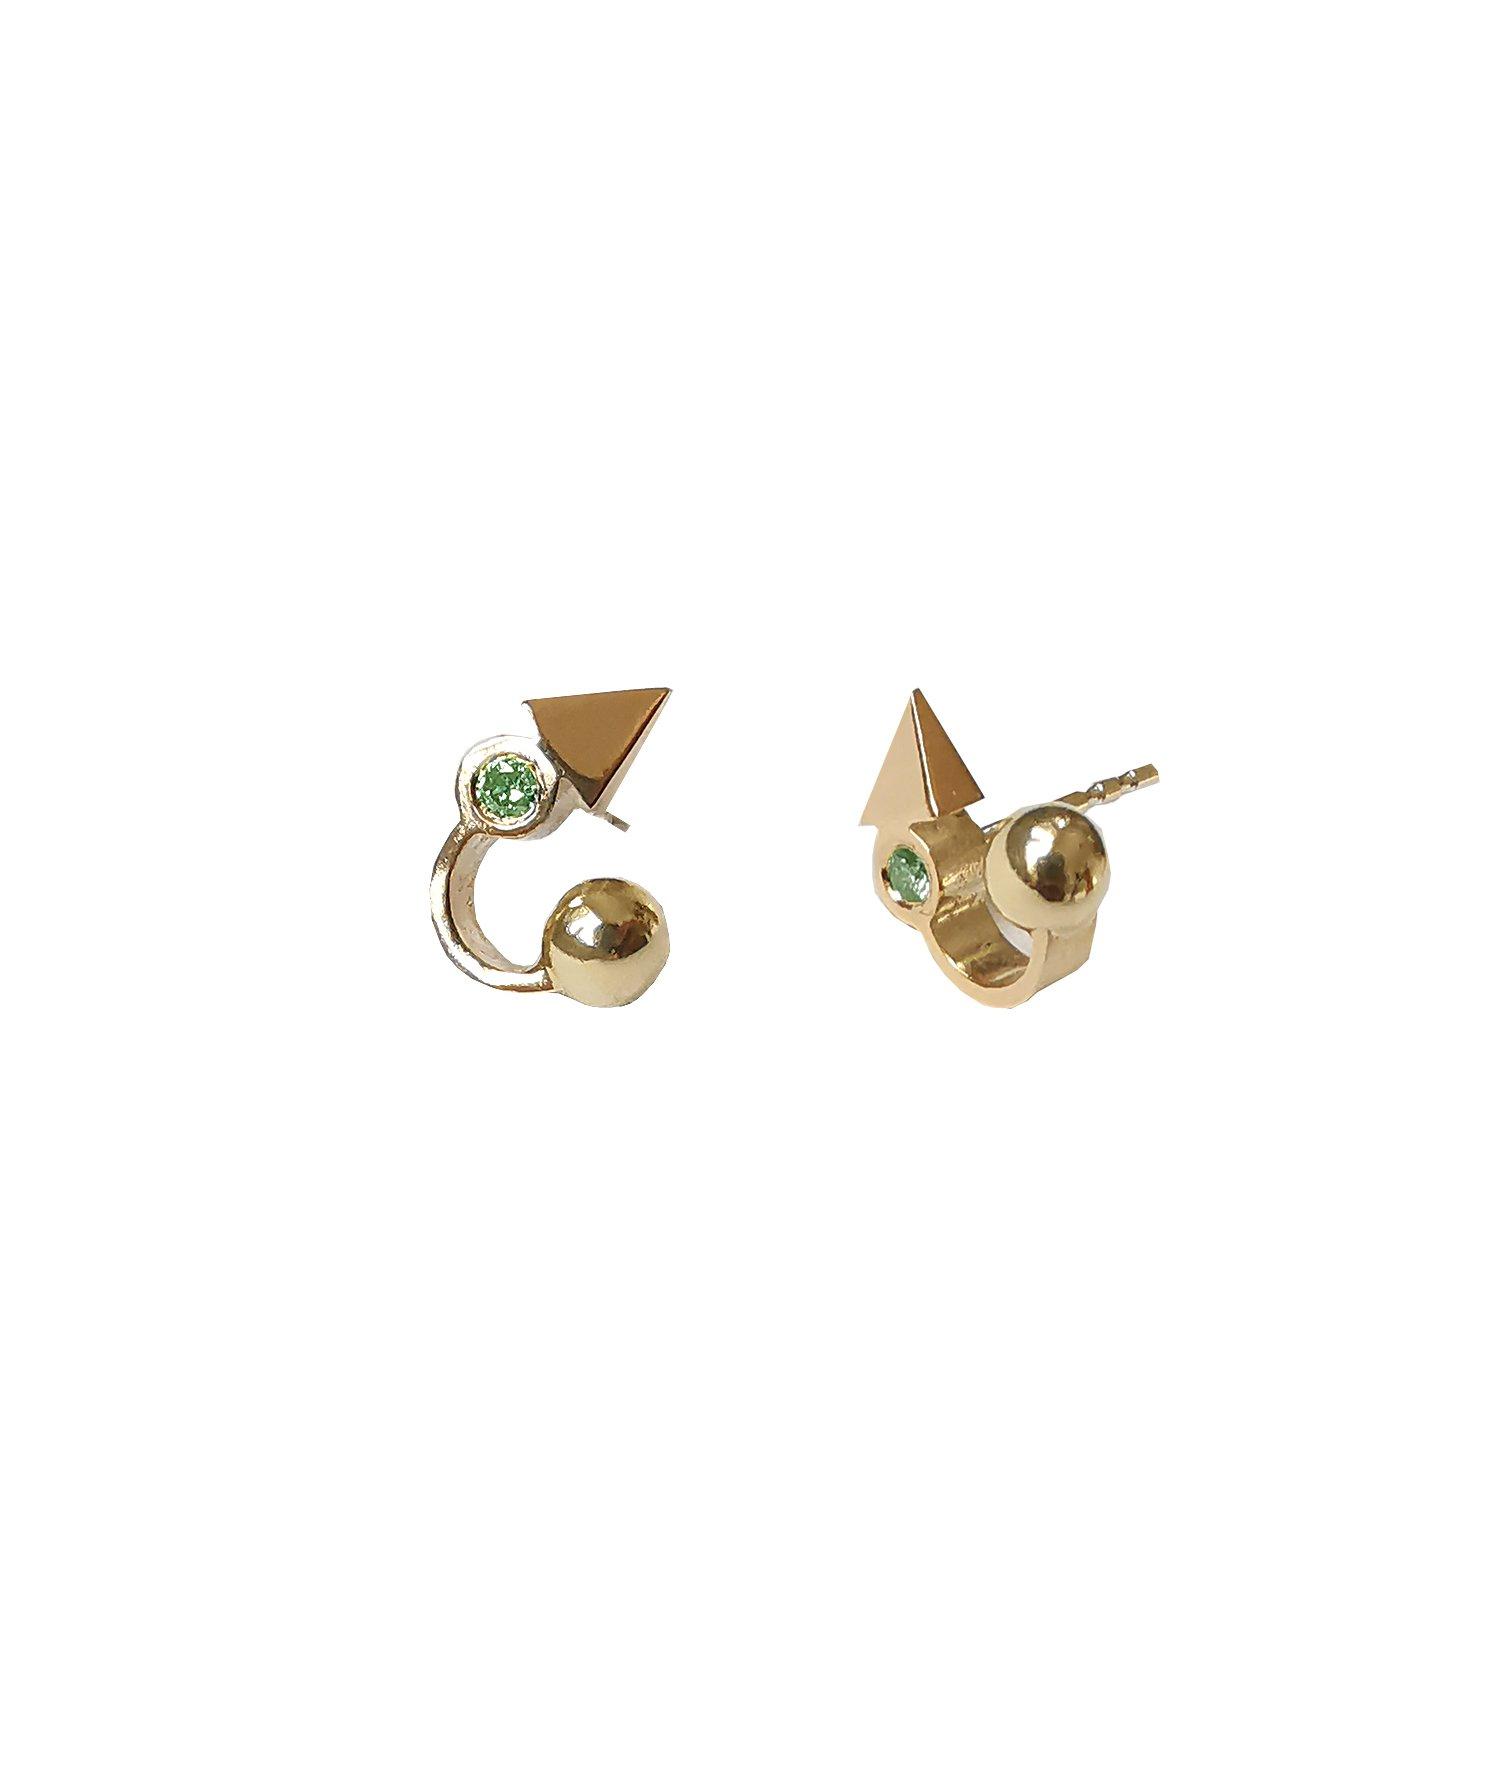 Image of Microdot no3 /green diamond